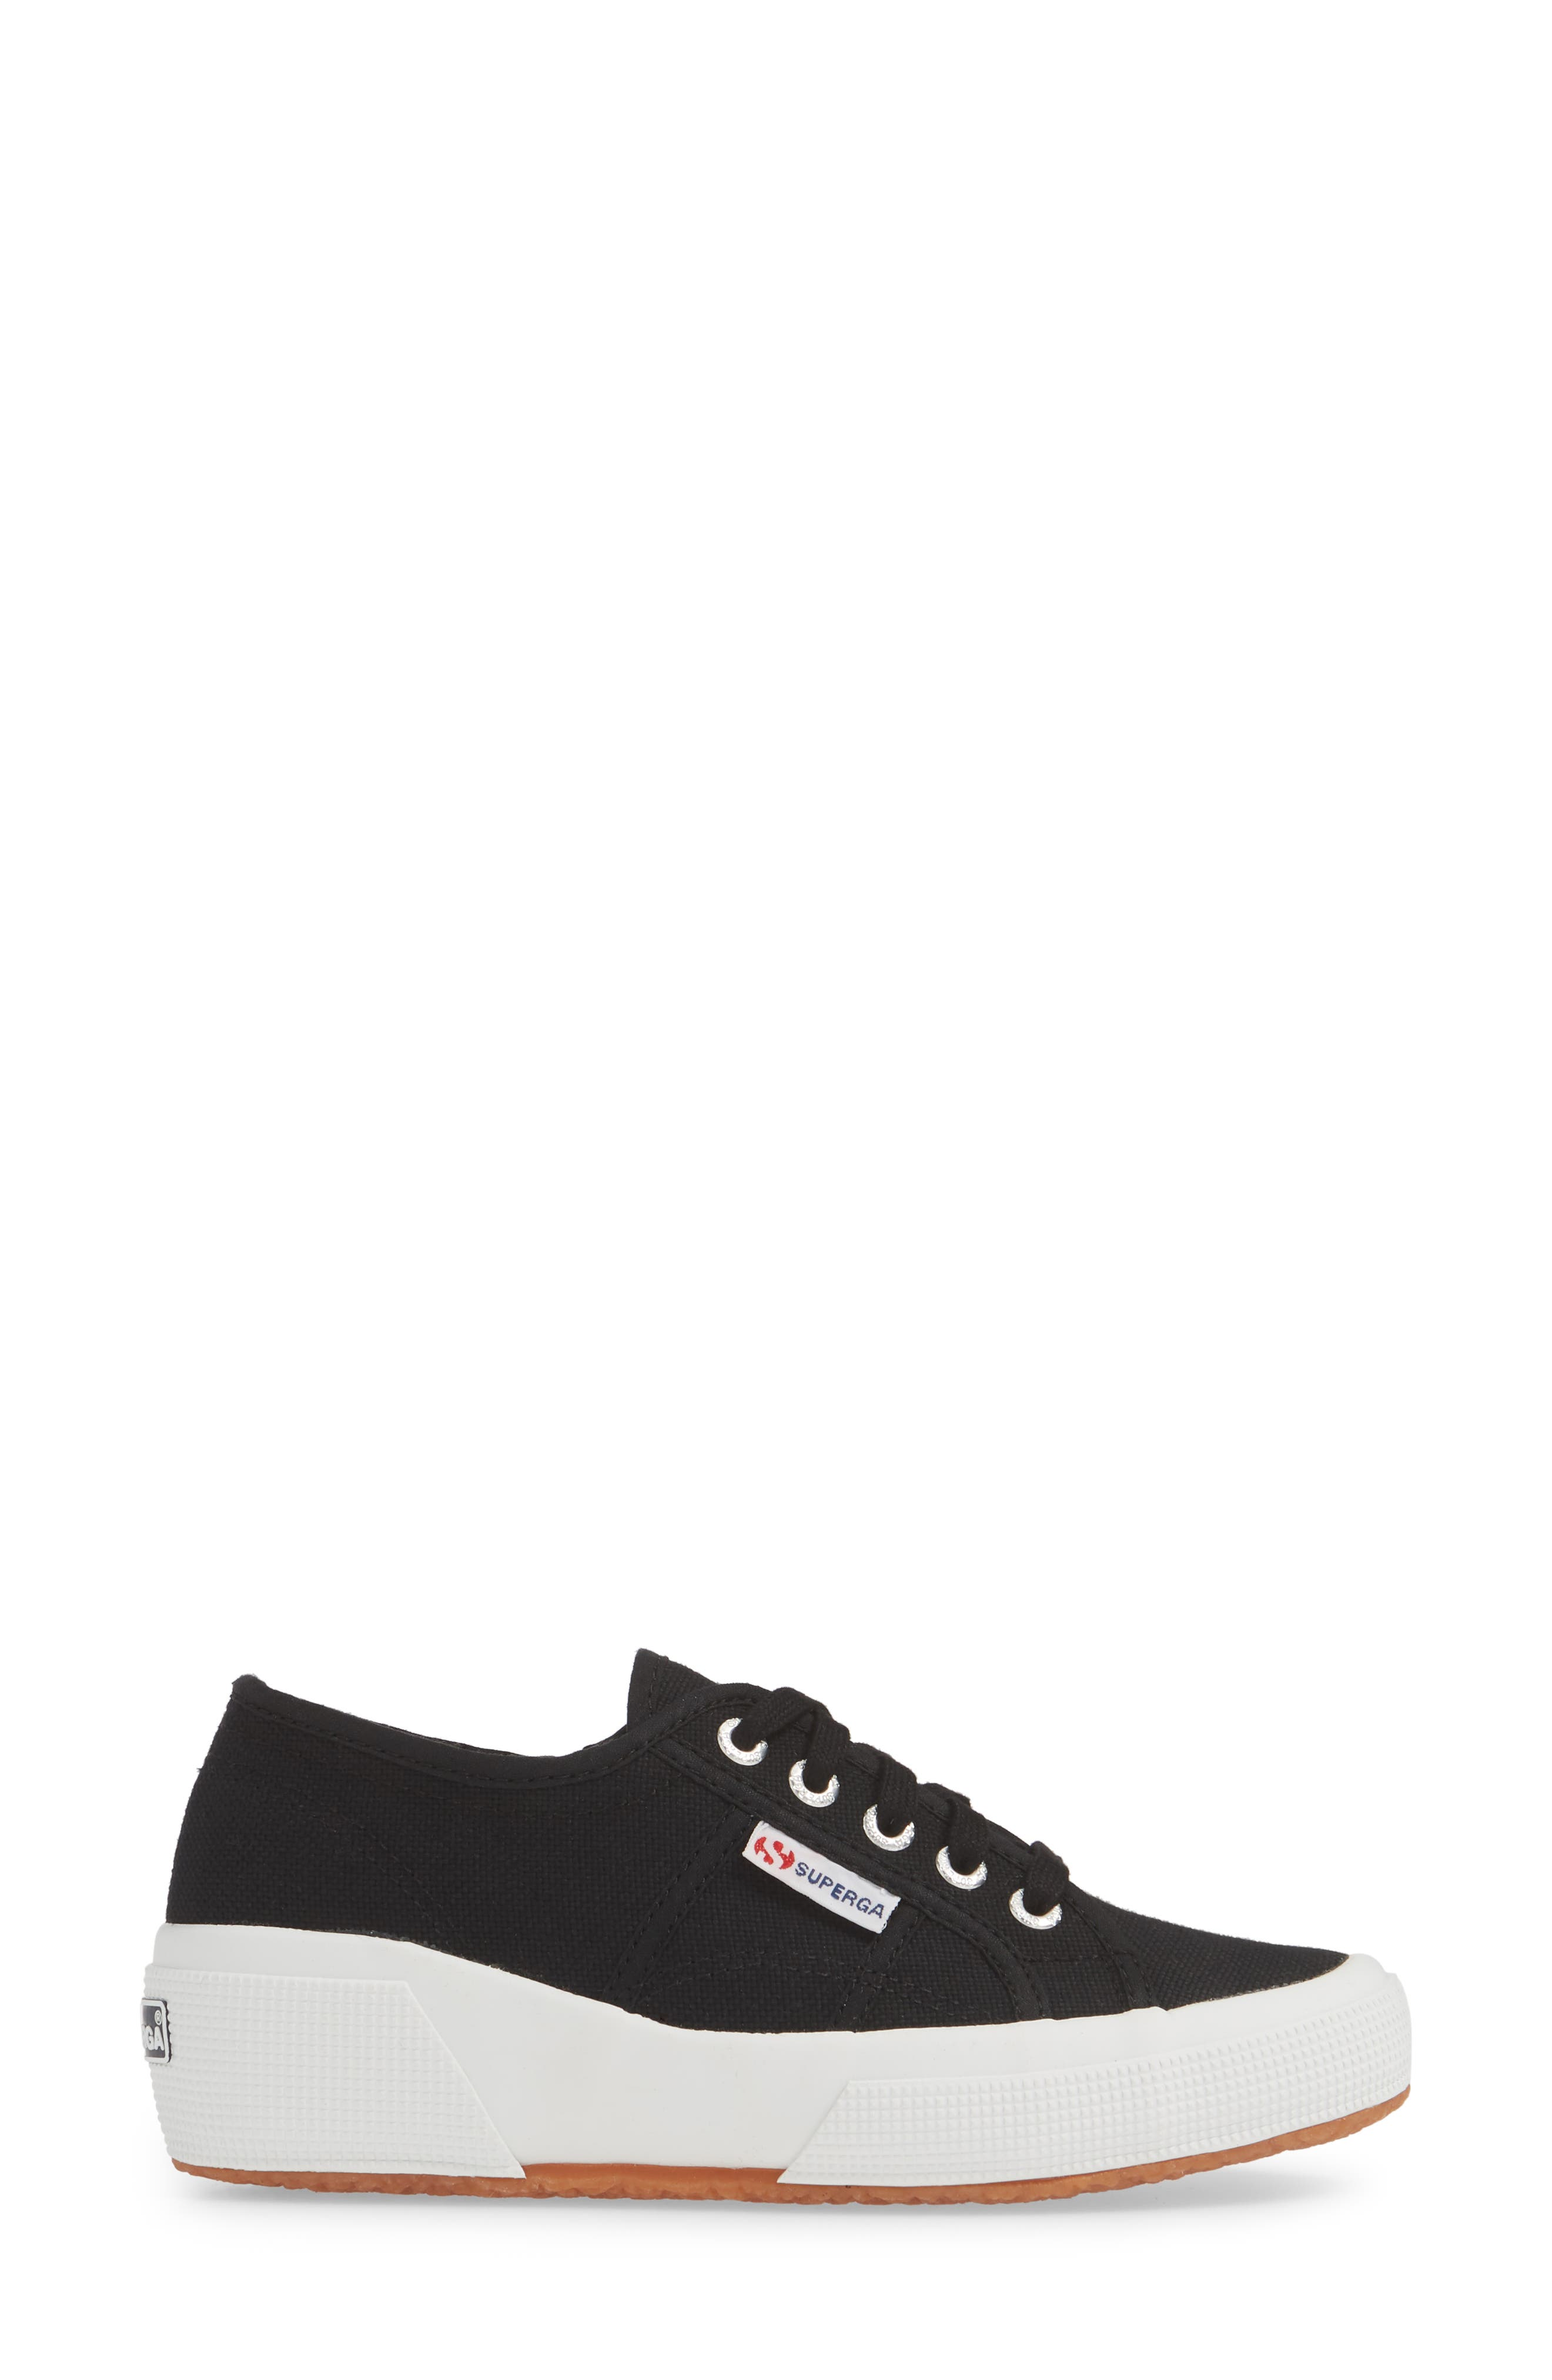 SUPERGA,                             'Linea' Wedge Sneaker,                             Alternate thumbnail 3, color,                             BLACK / WHITE